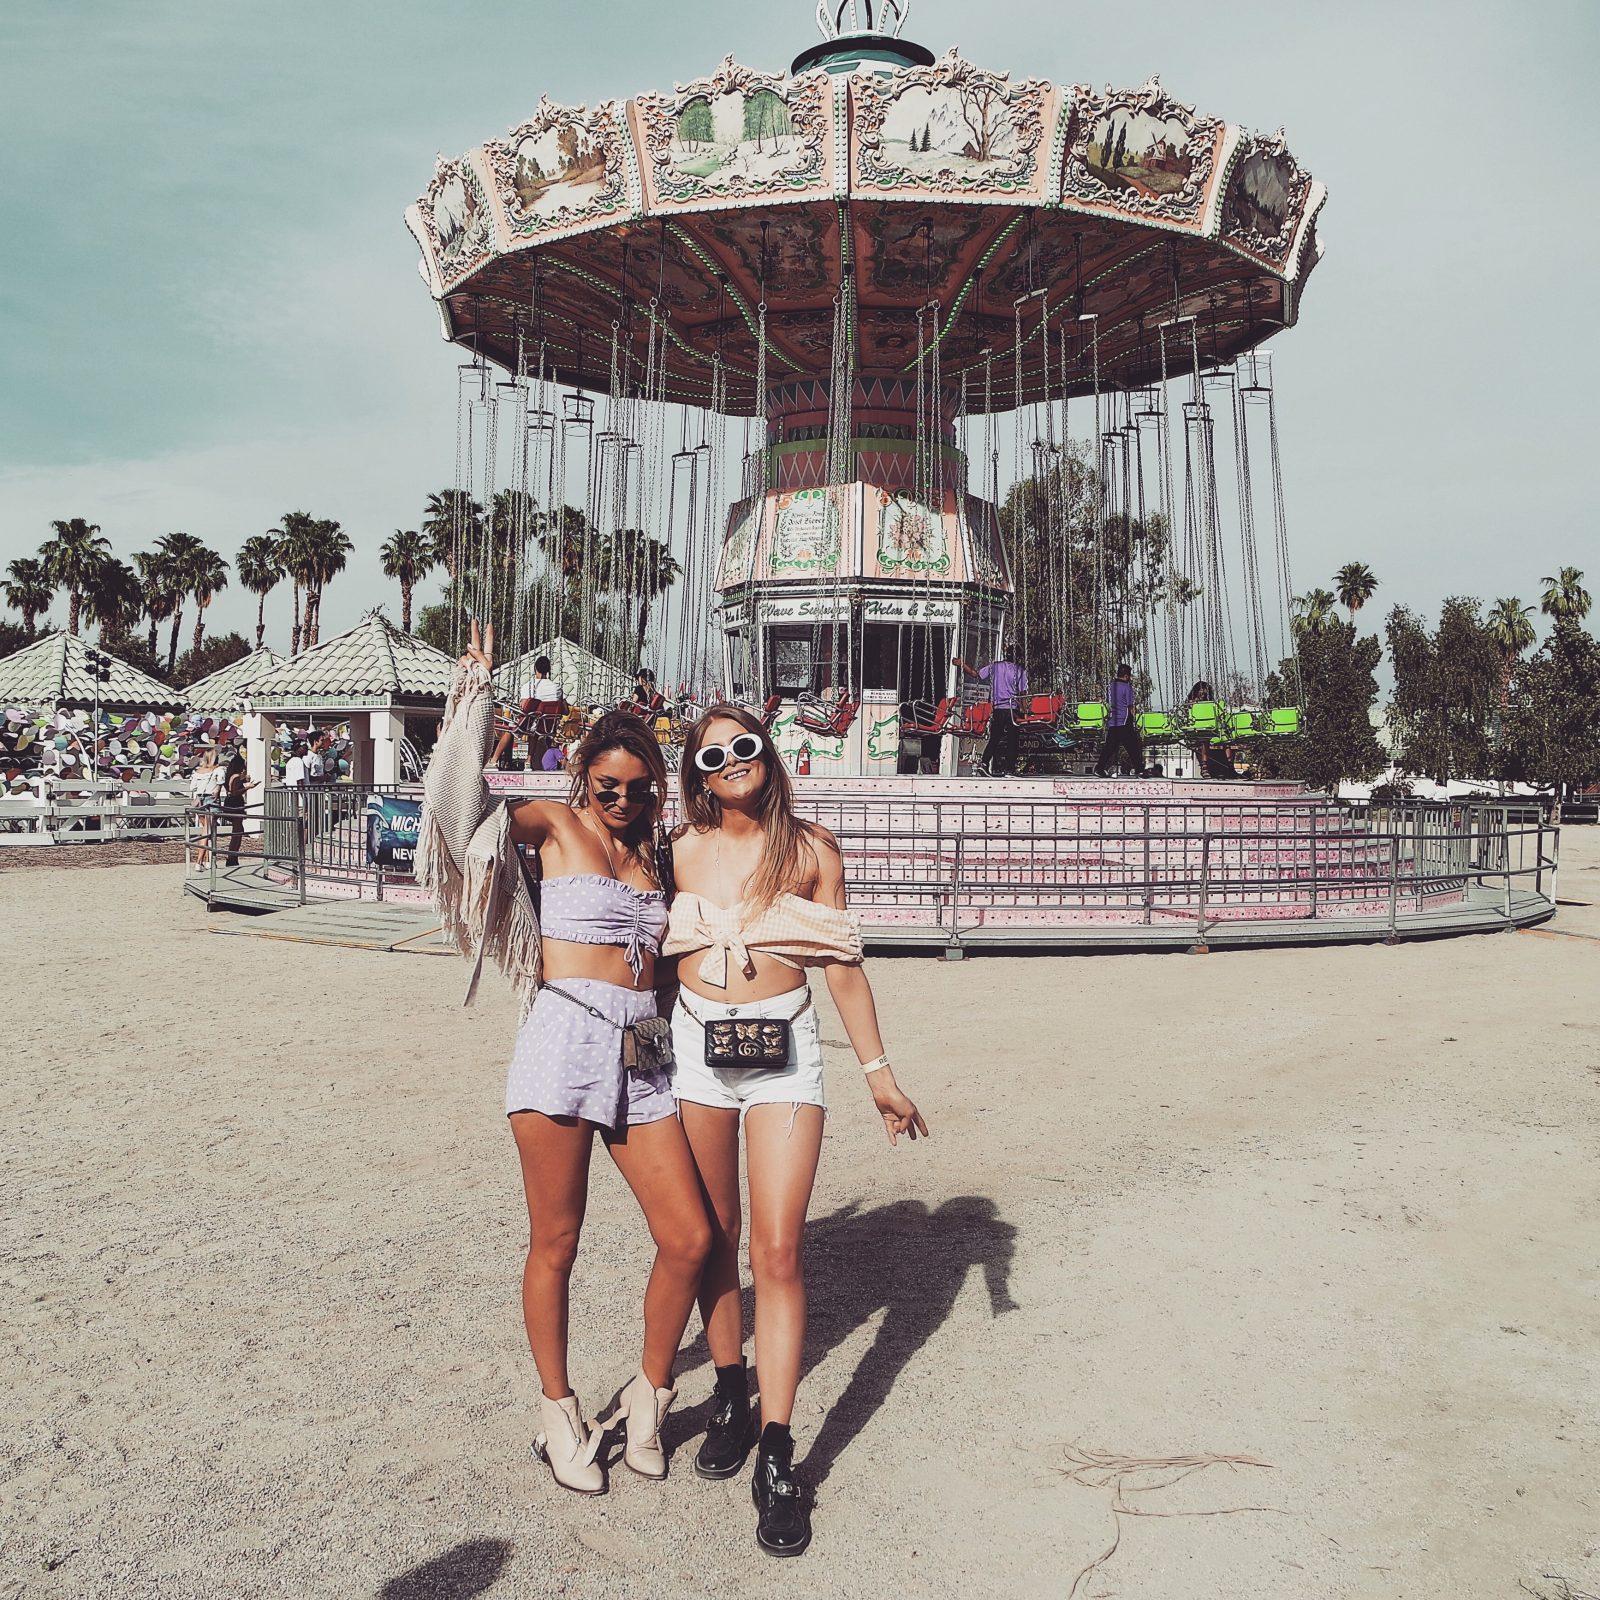 Revolve Festival - Sisters